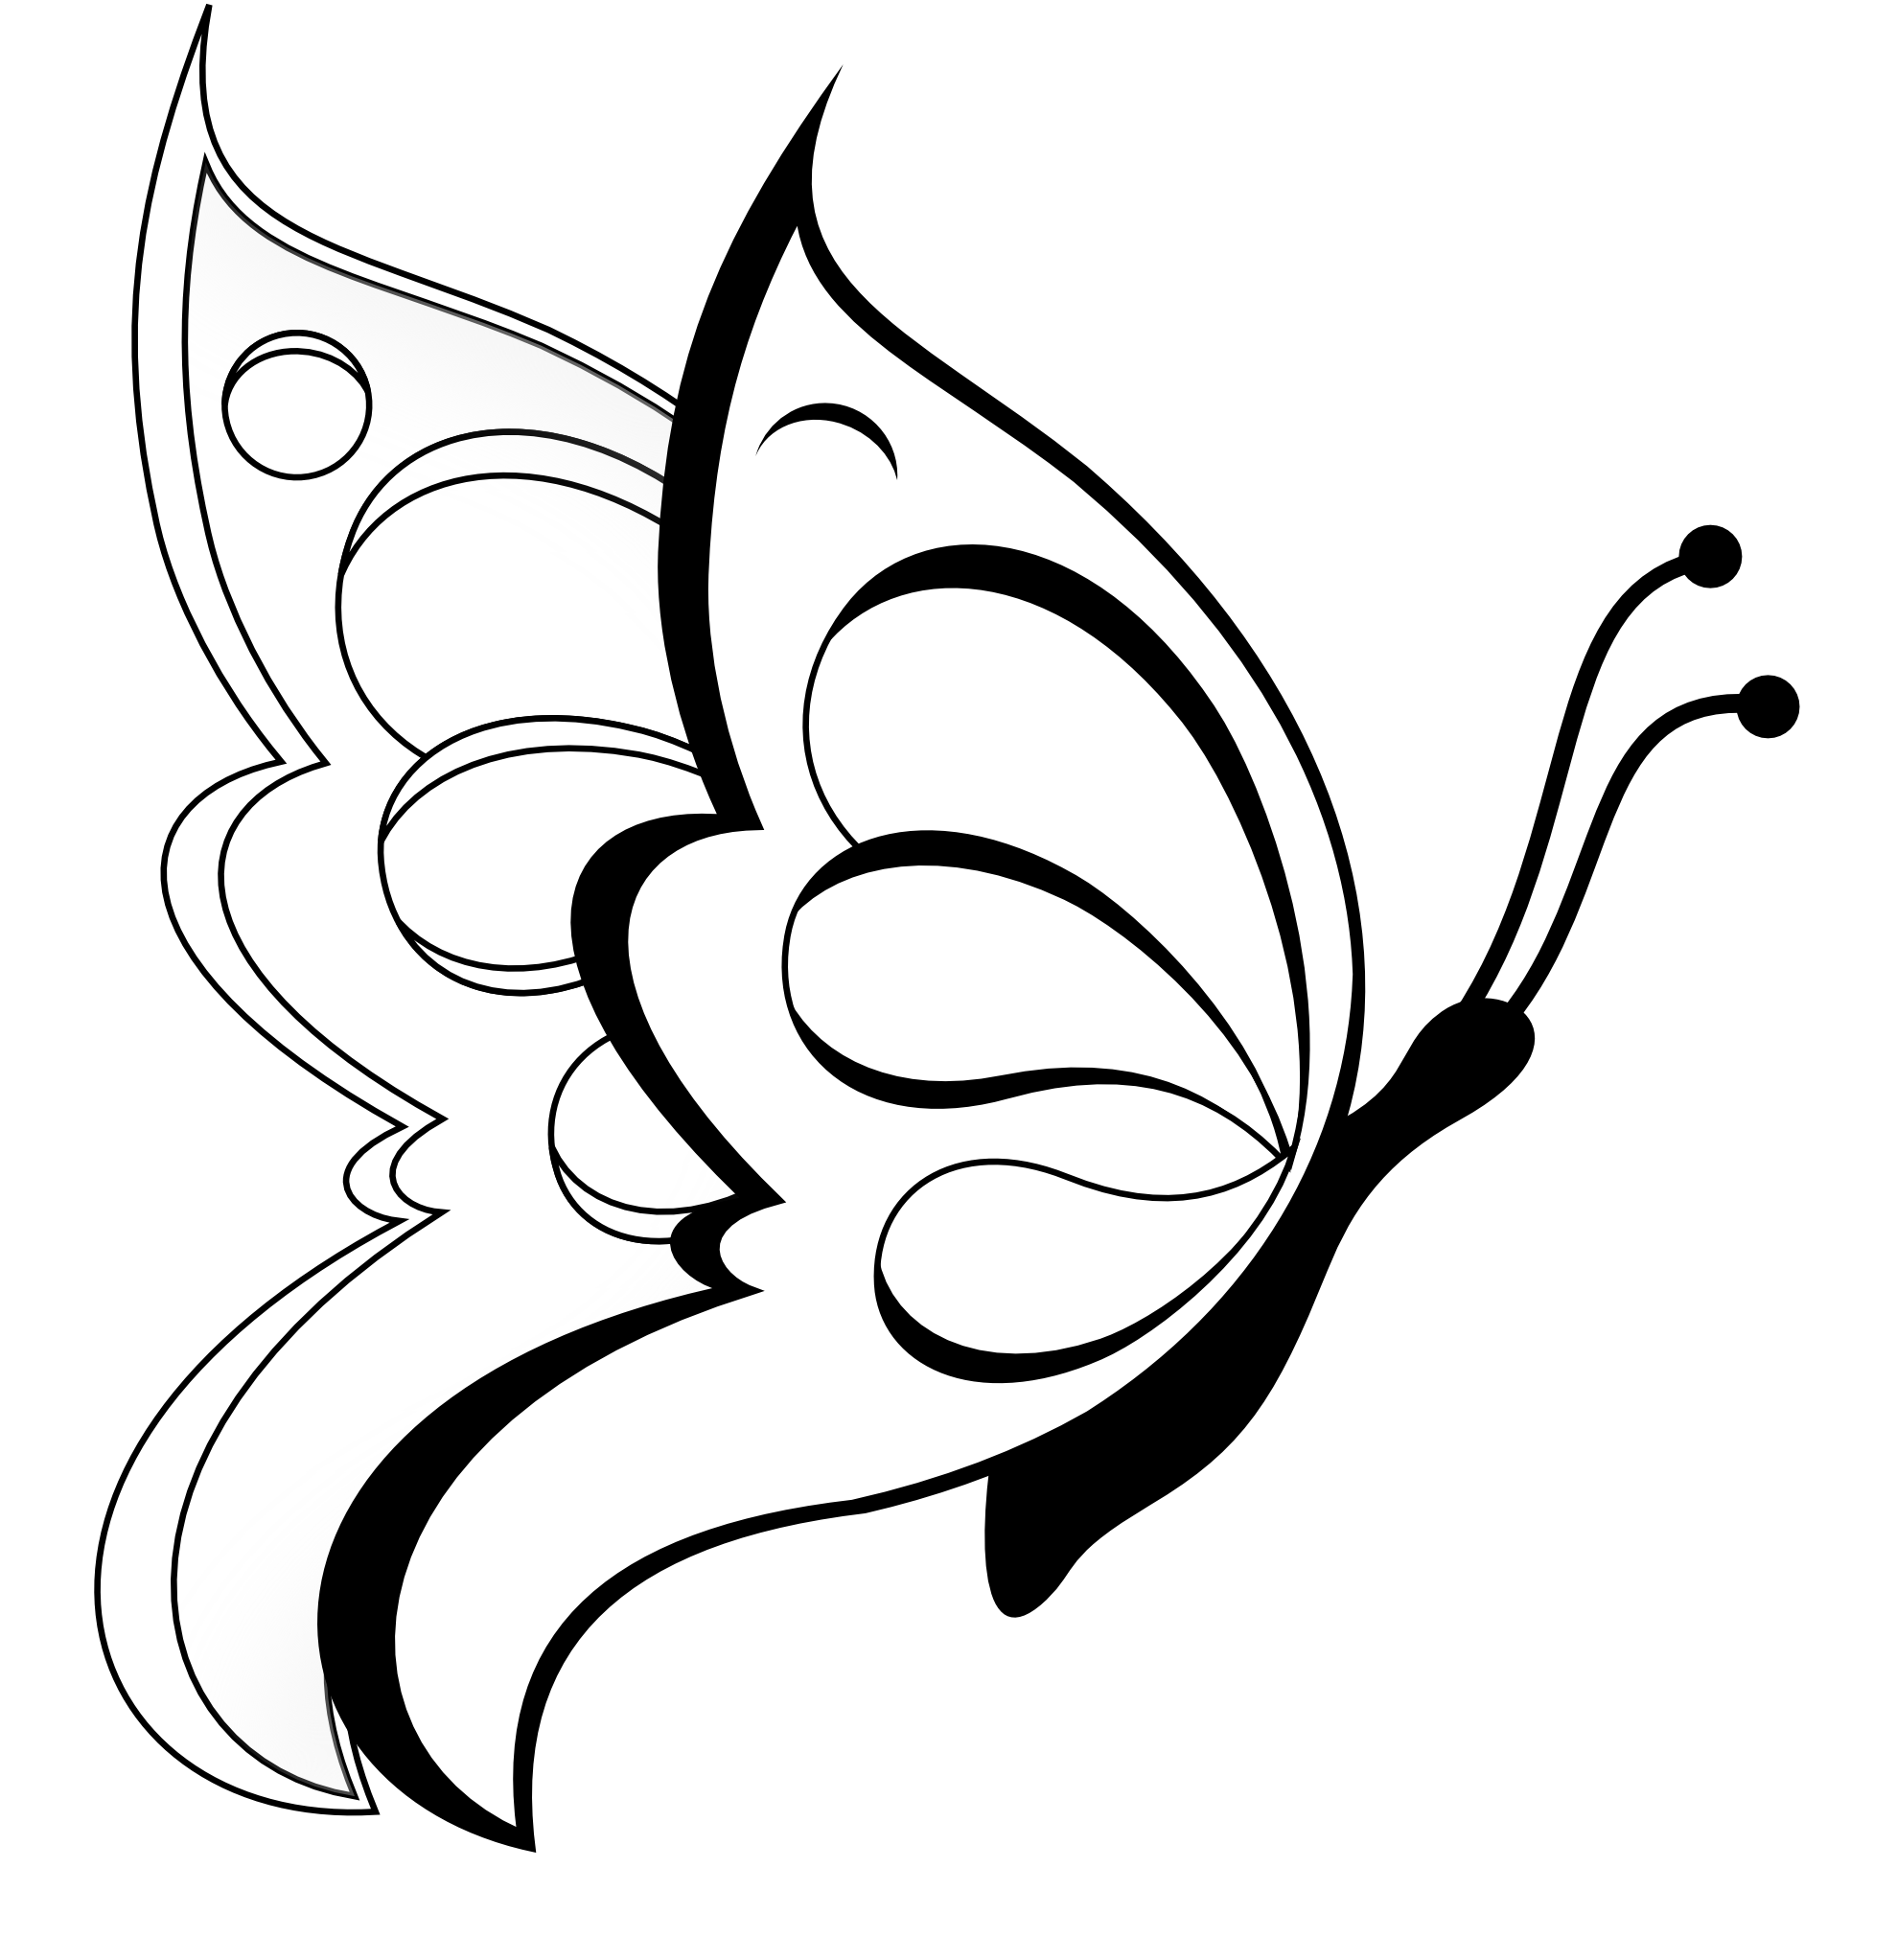 svg free Butterfly black white line. Butterflies clipart swirl.